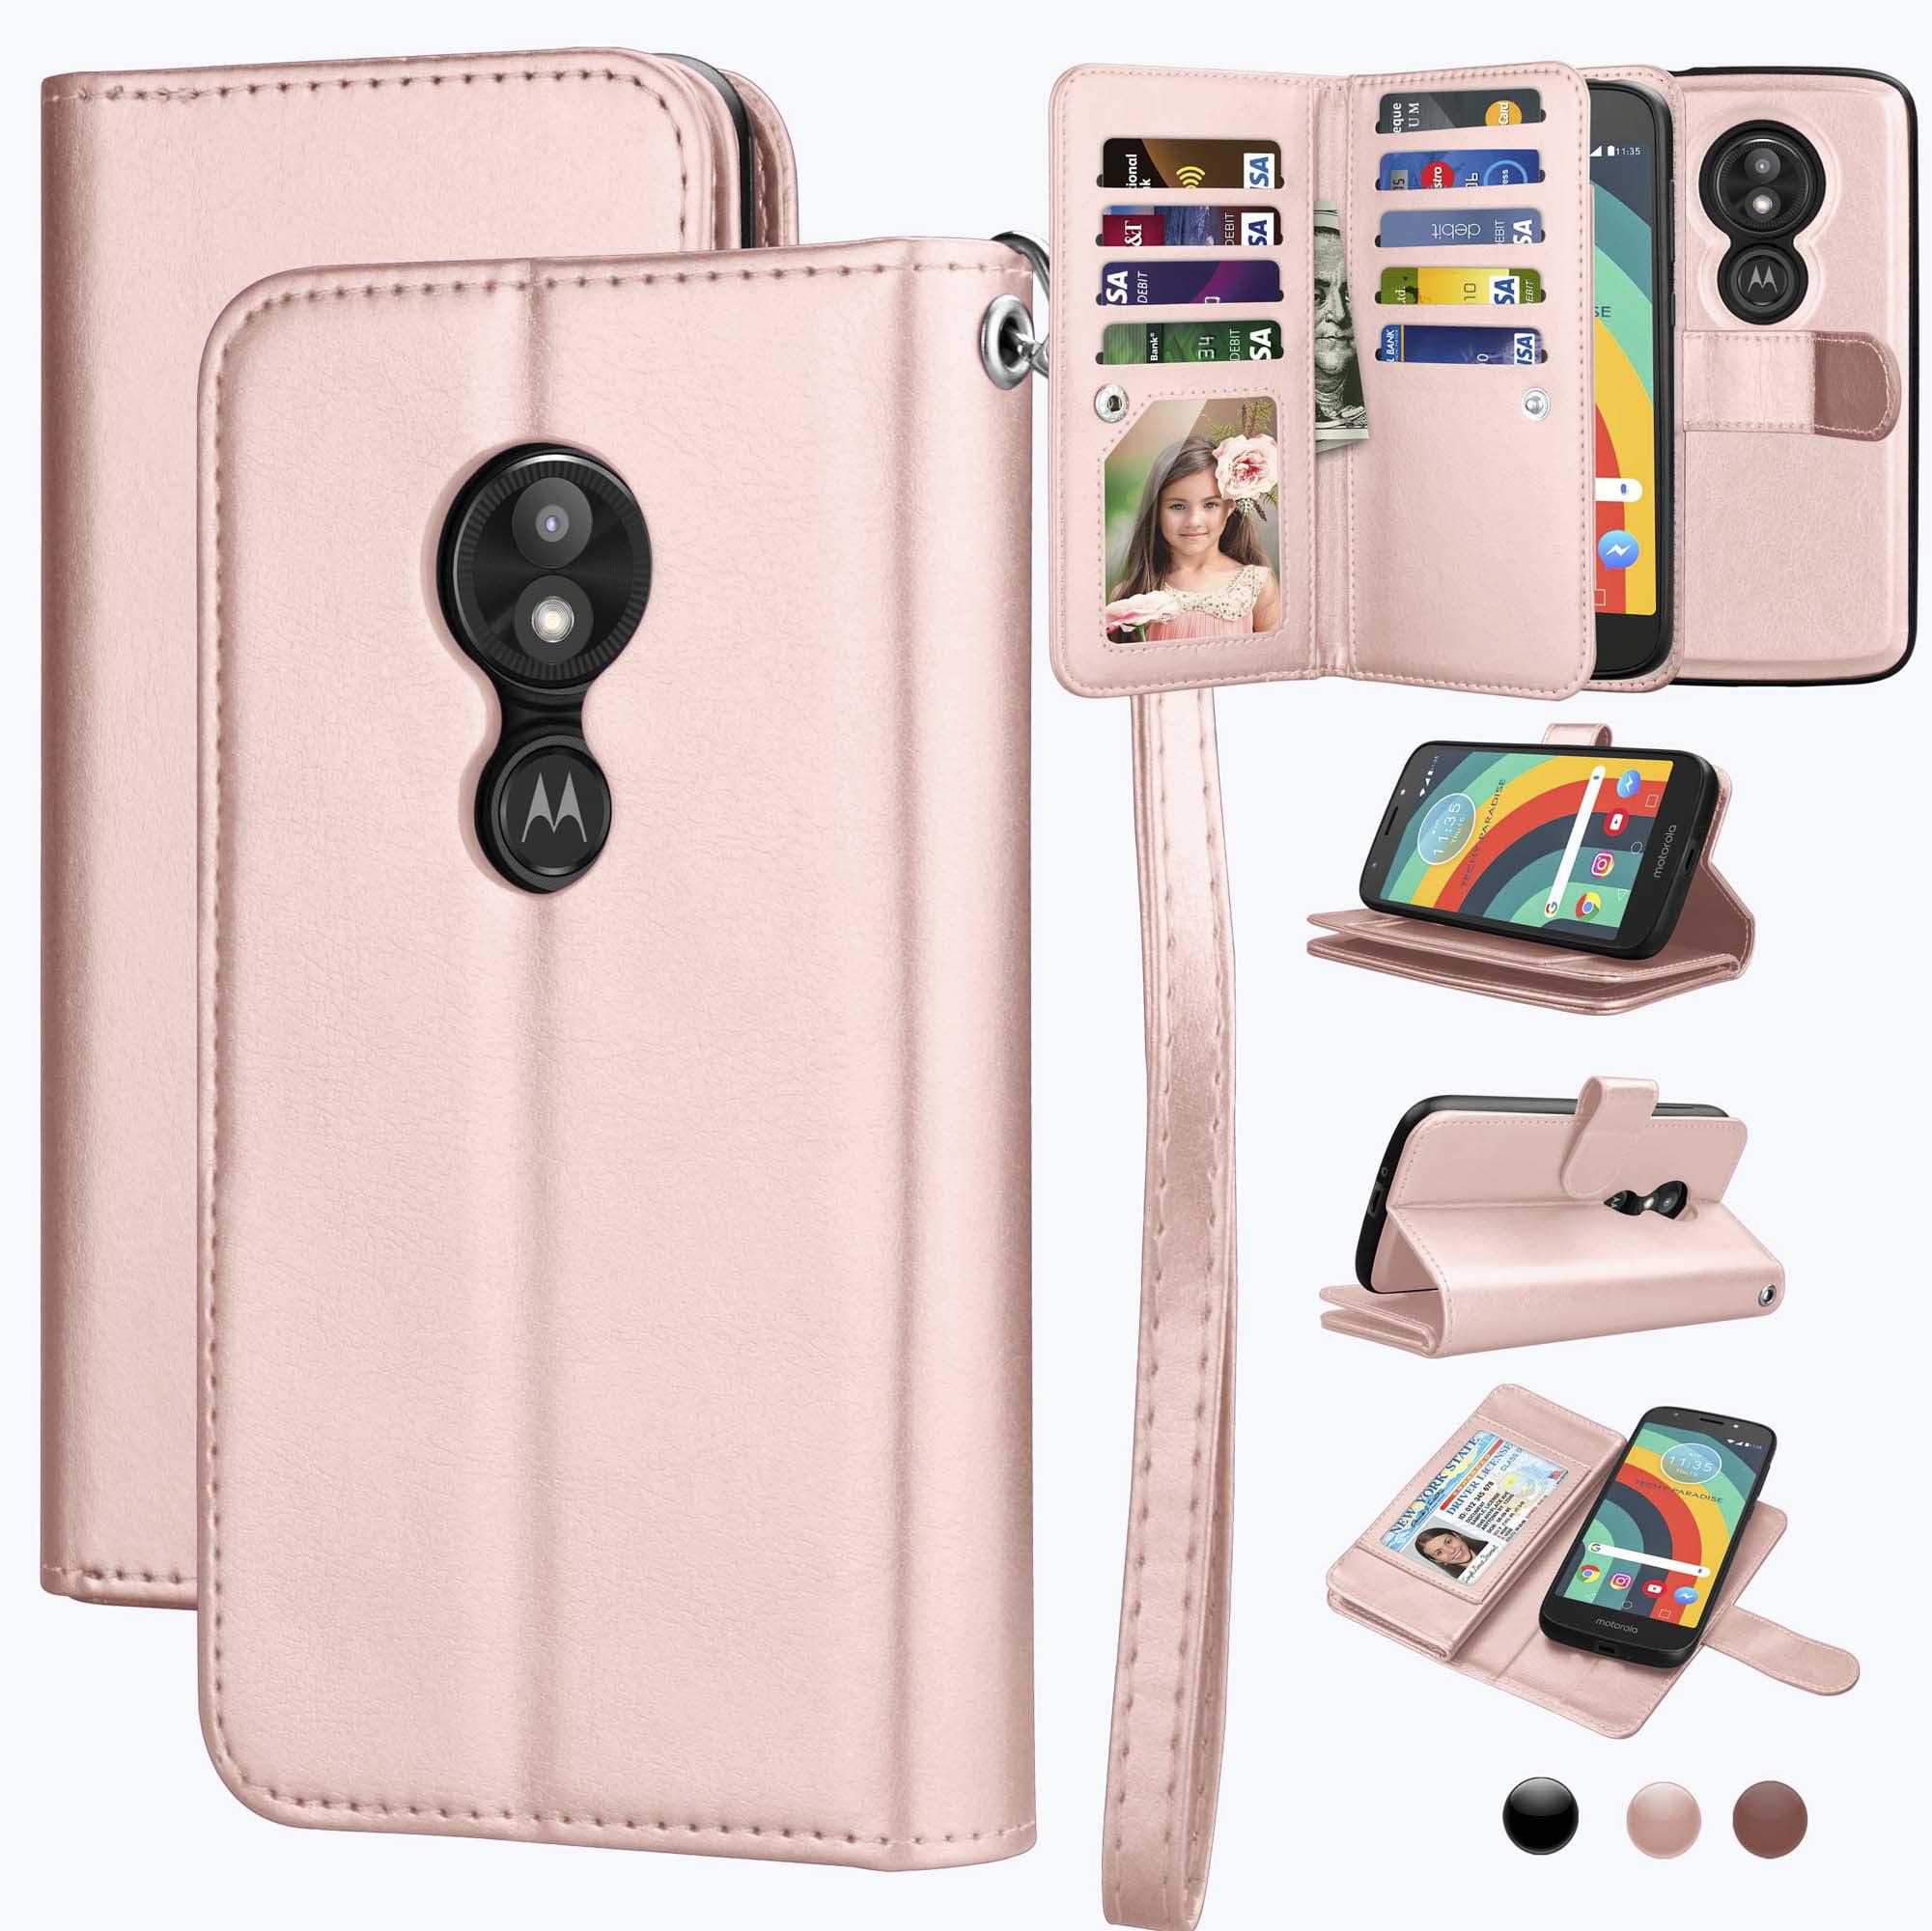 Moto E5 Play Case, Moto E5 Cruise Case, Moto E5 Play Wallet Case, Njjex 11 Card Slots Detachable Magnetic Wallet Case PU Leather Flip Cover Wrist